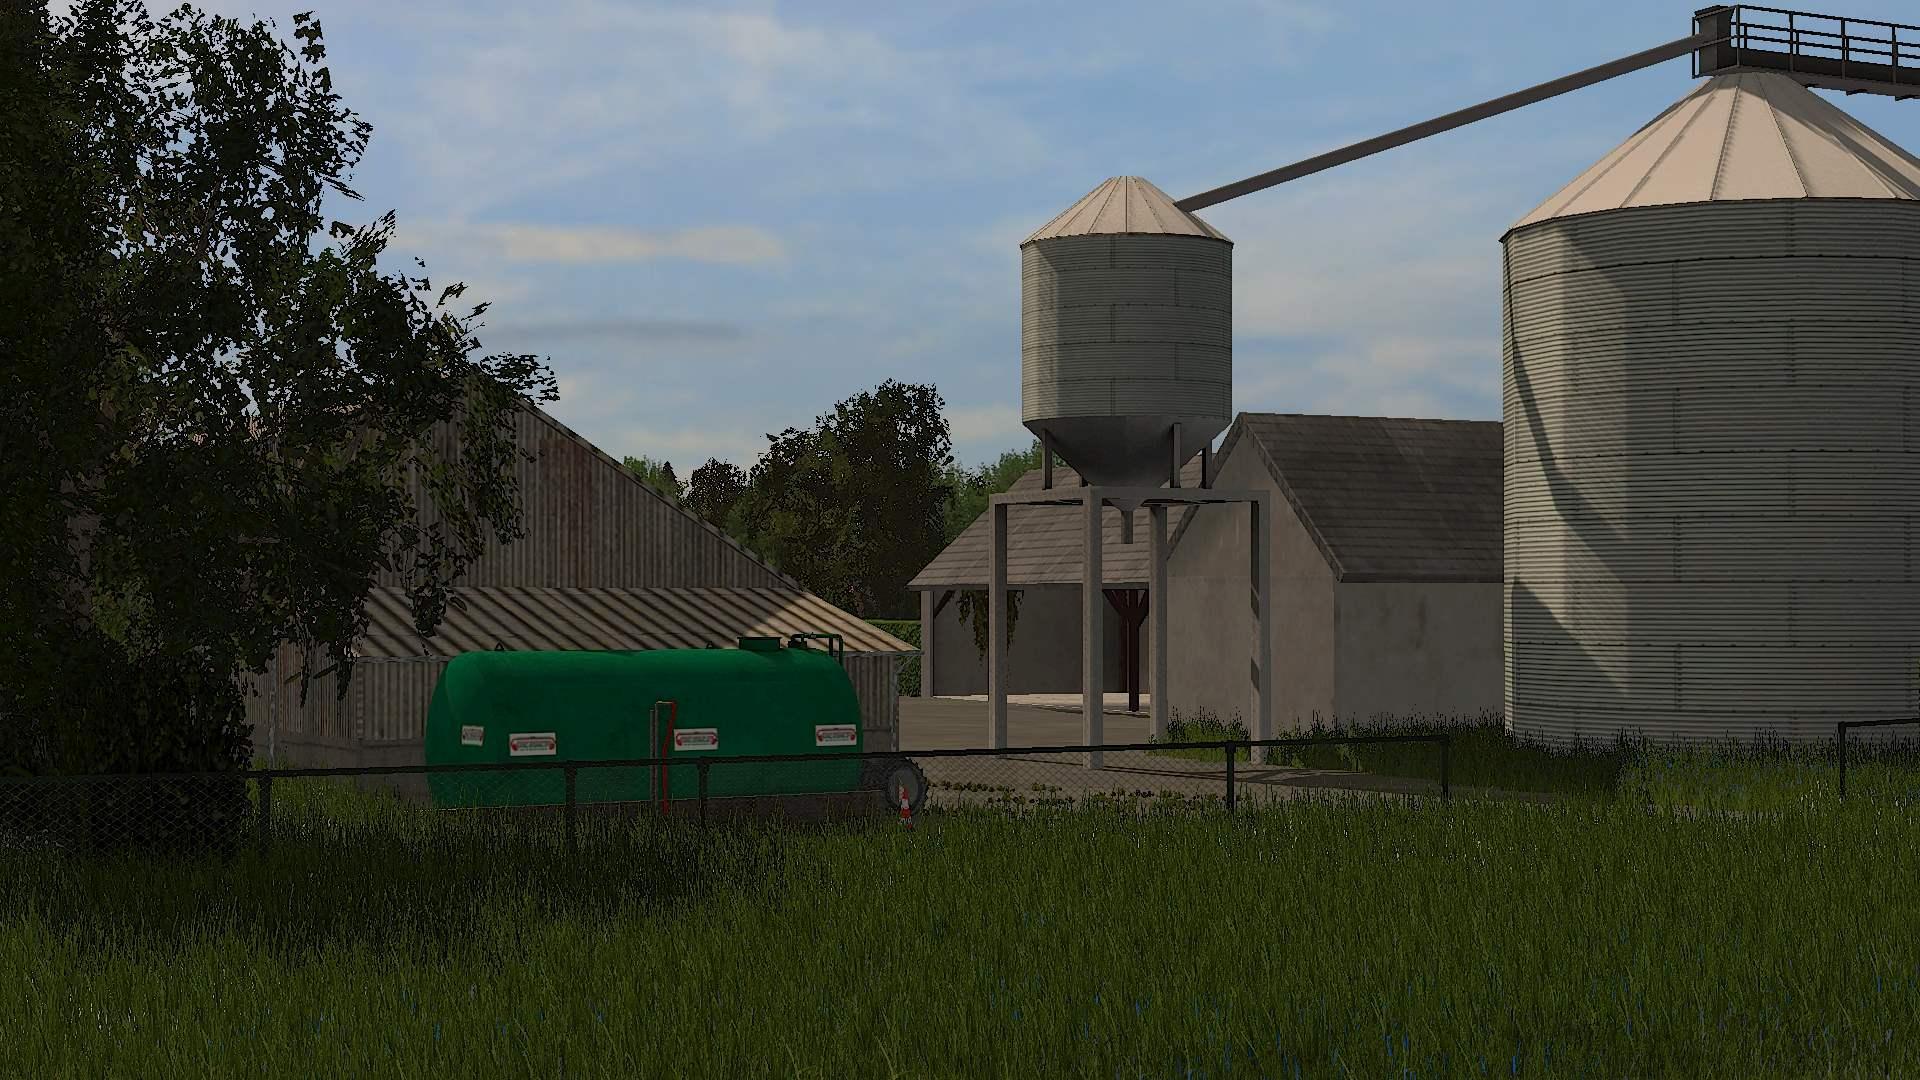 petit coin de beauce v1 0 fs17 farming simulator 17 mod fs 2017 mod. Black Bedroom Furniture Sets. Home Design Ideas